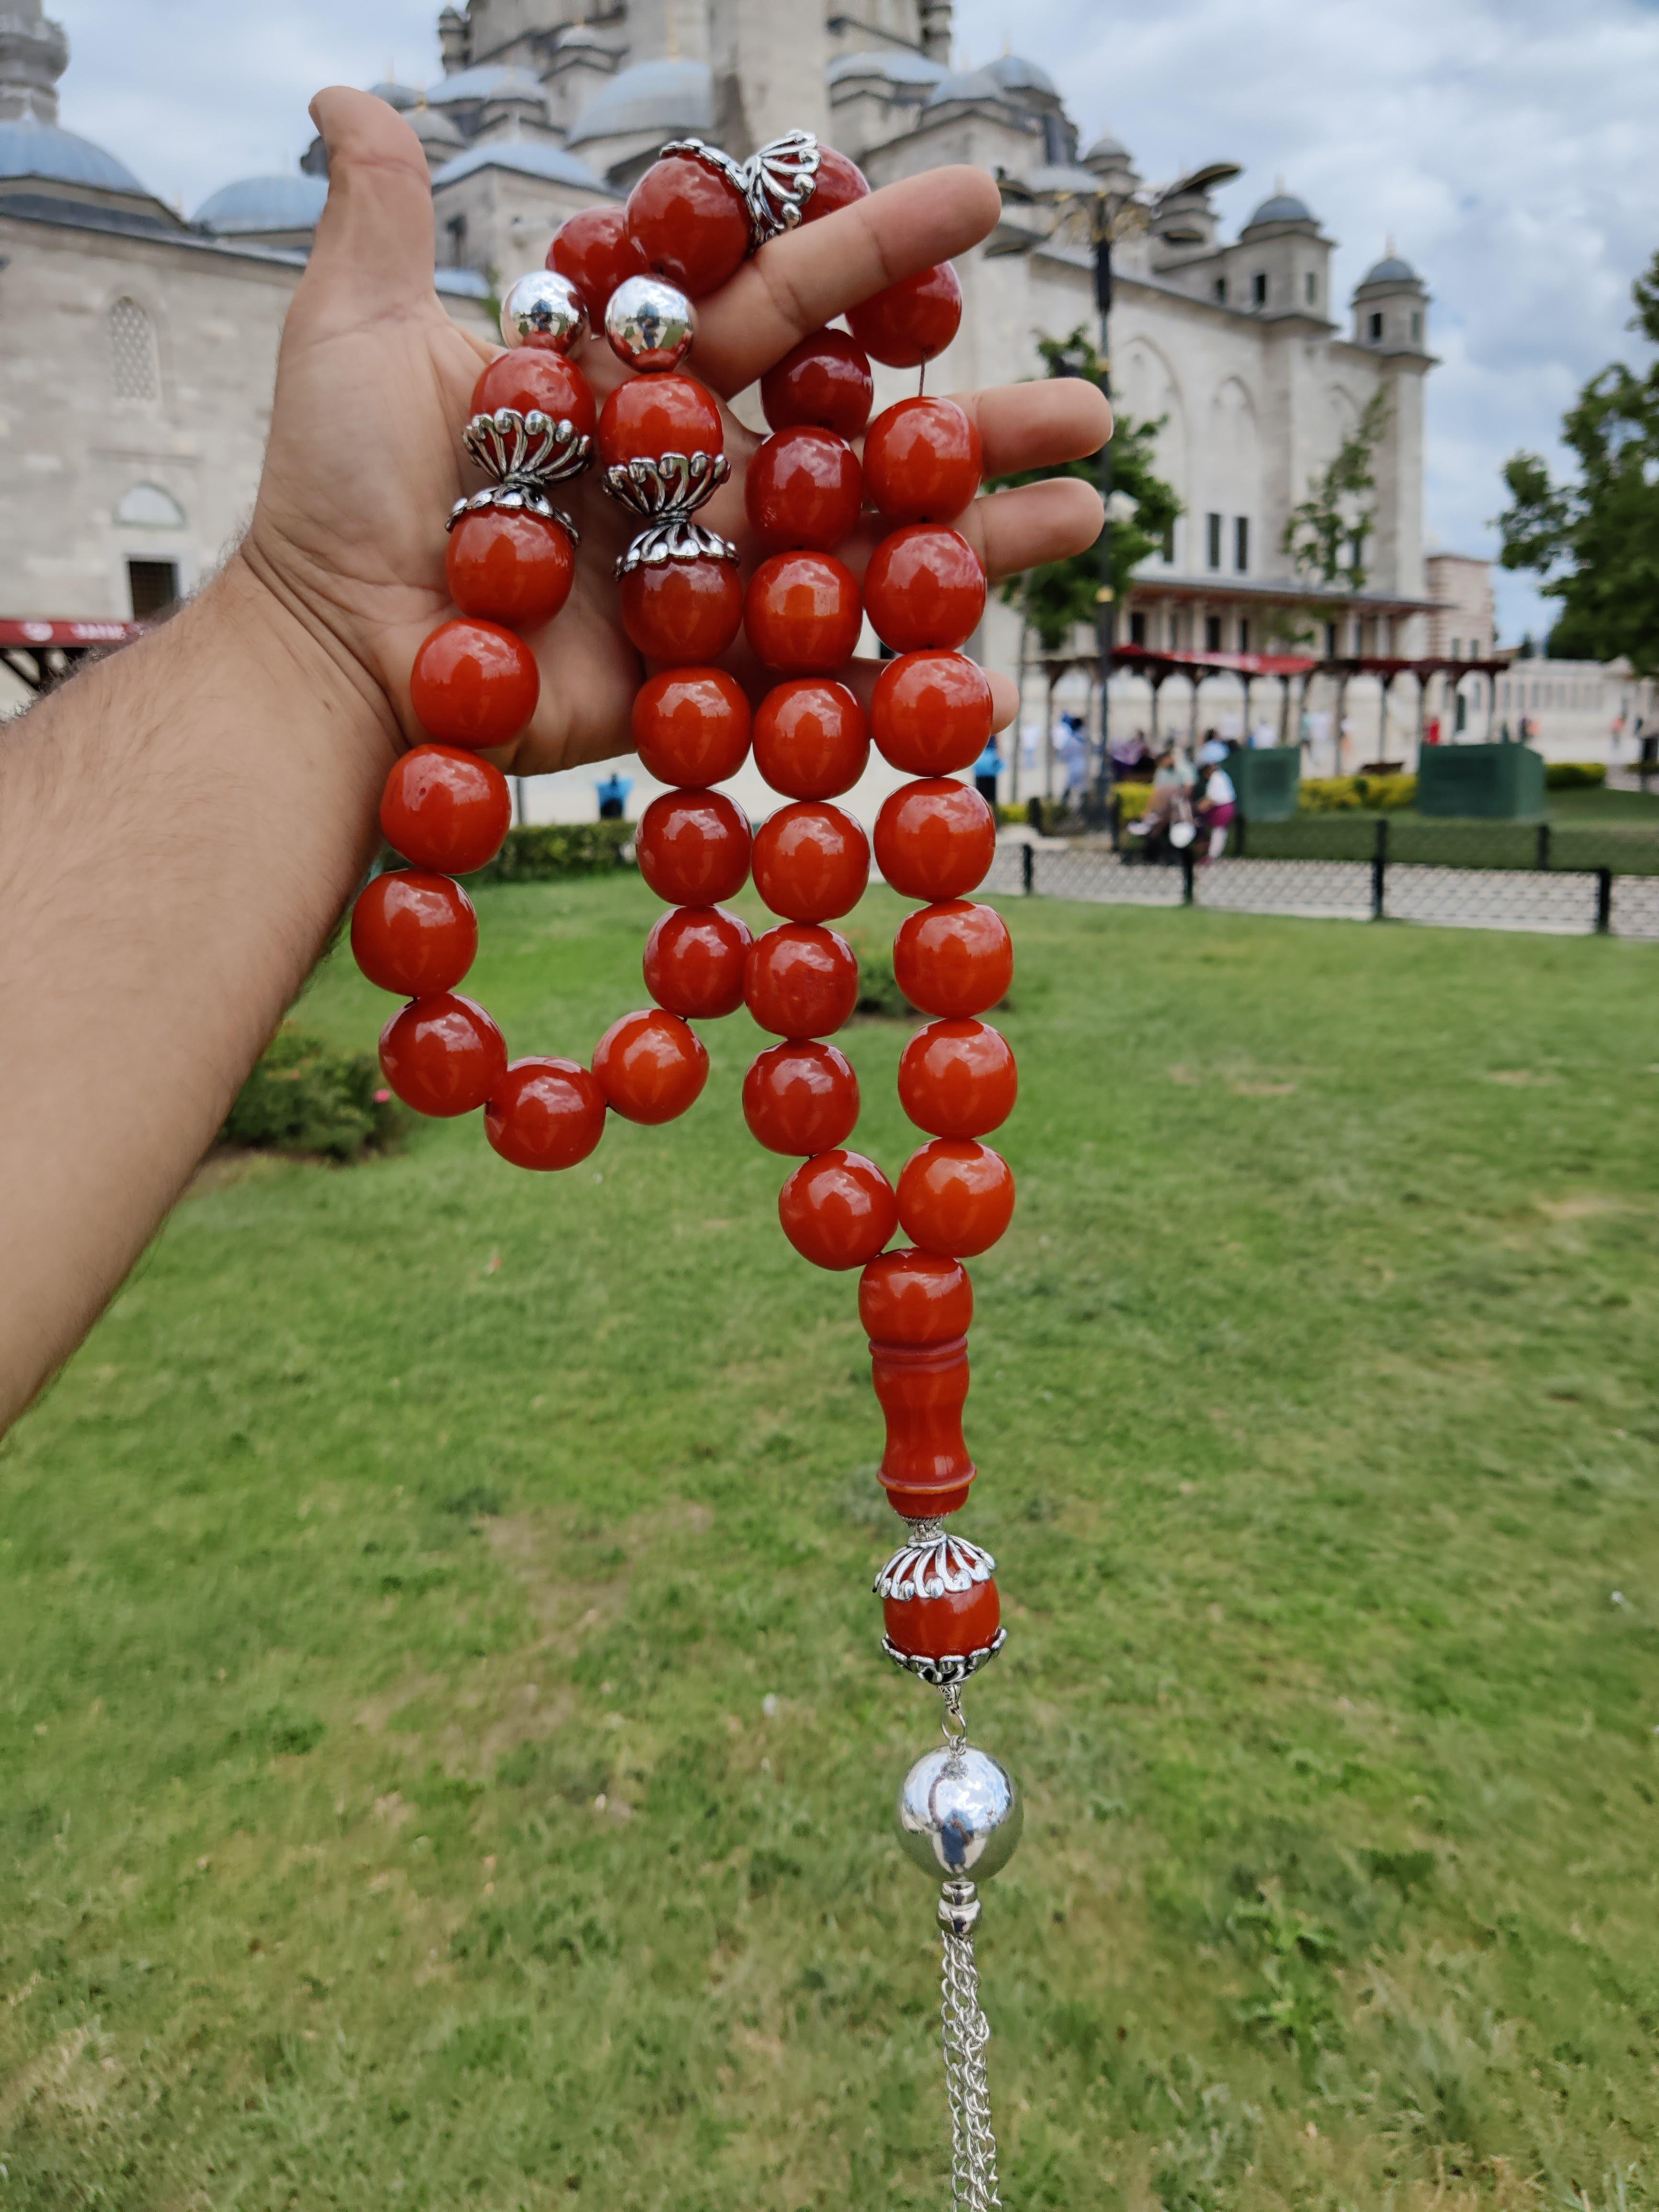 Ottoman Rare Antique Faturan German Amber Sandalous Misbaha Prayerbeads Rosary Tasbih Tesbih  Cherry  Gift